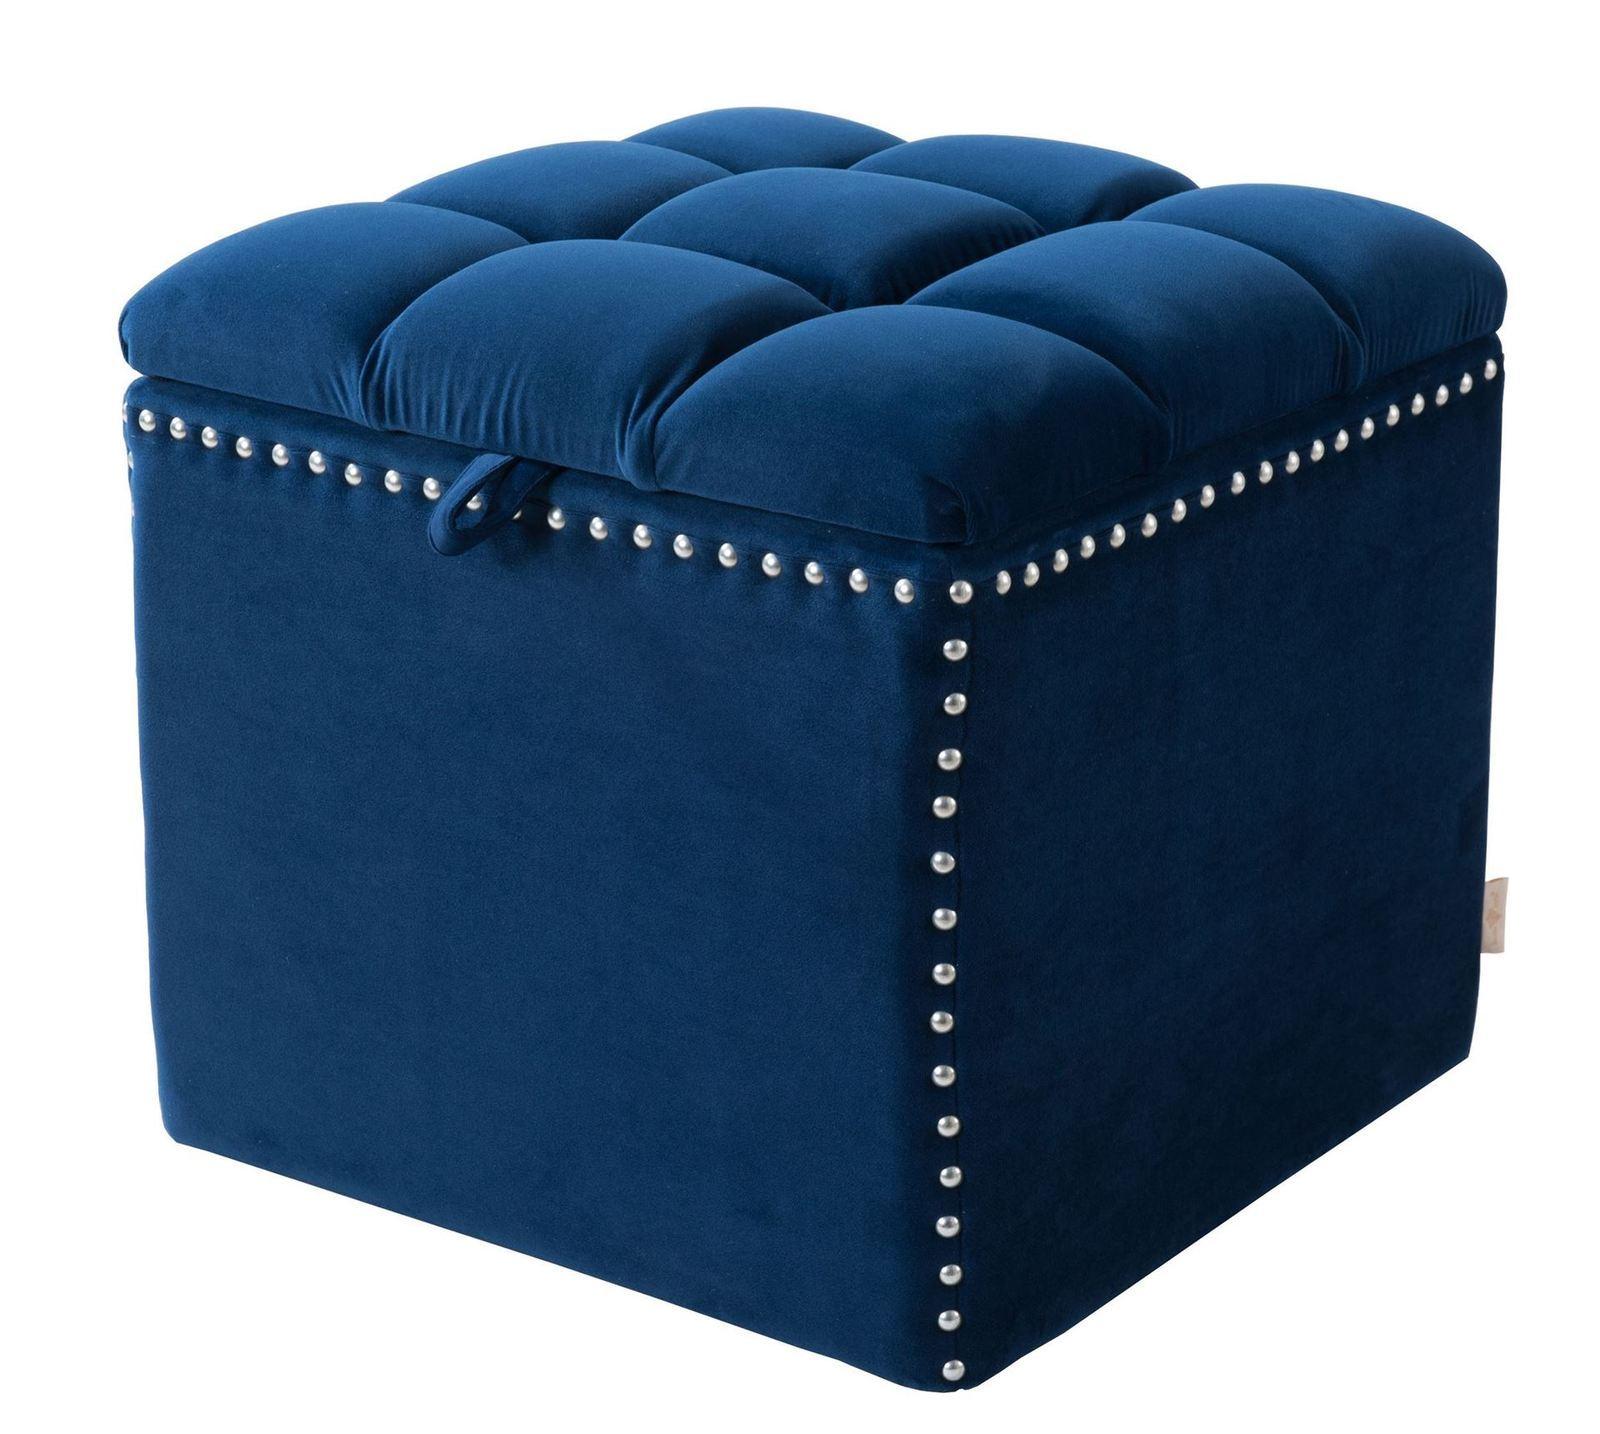 jennifer taylor home natalia storage ottoman navy blue ottomans footstools poufs. Black Bedroom Furniture Sets. Home Design Ideas